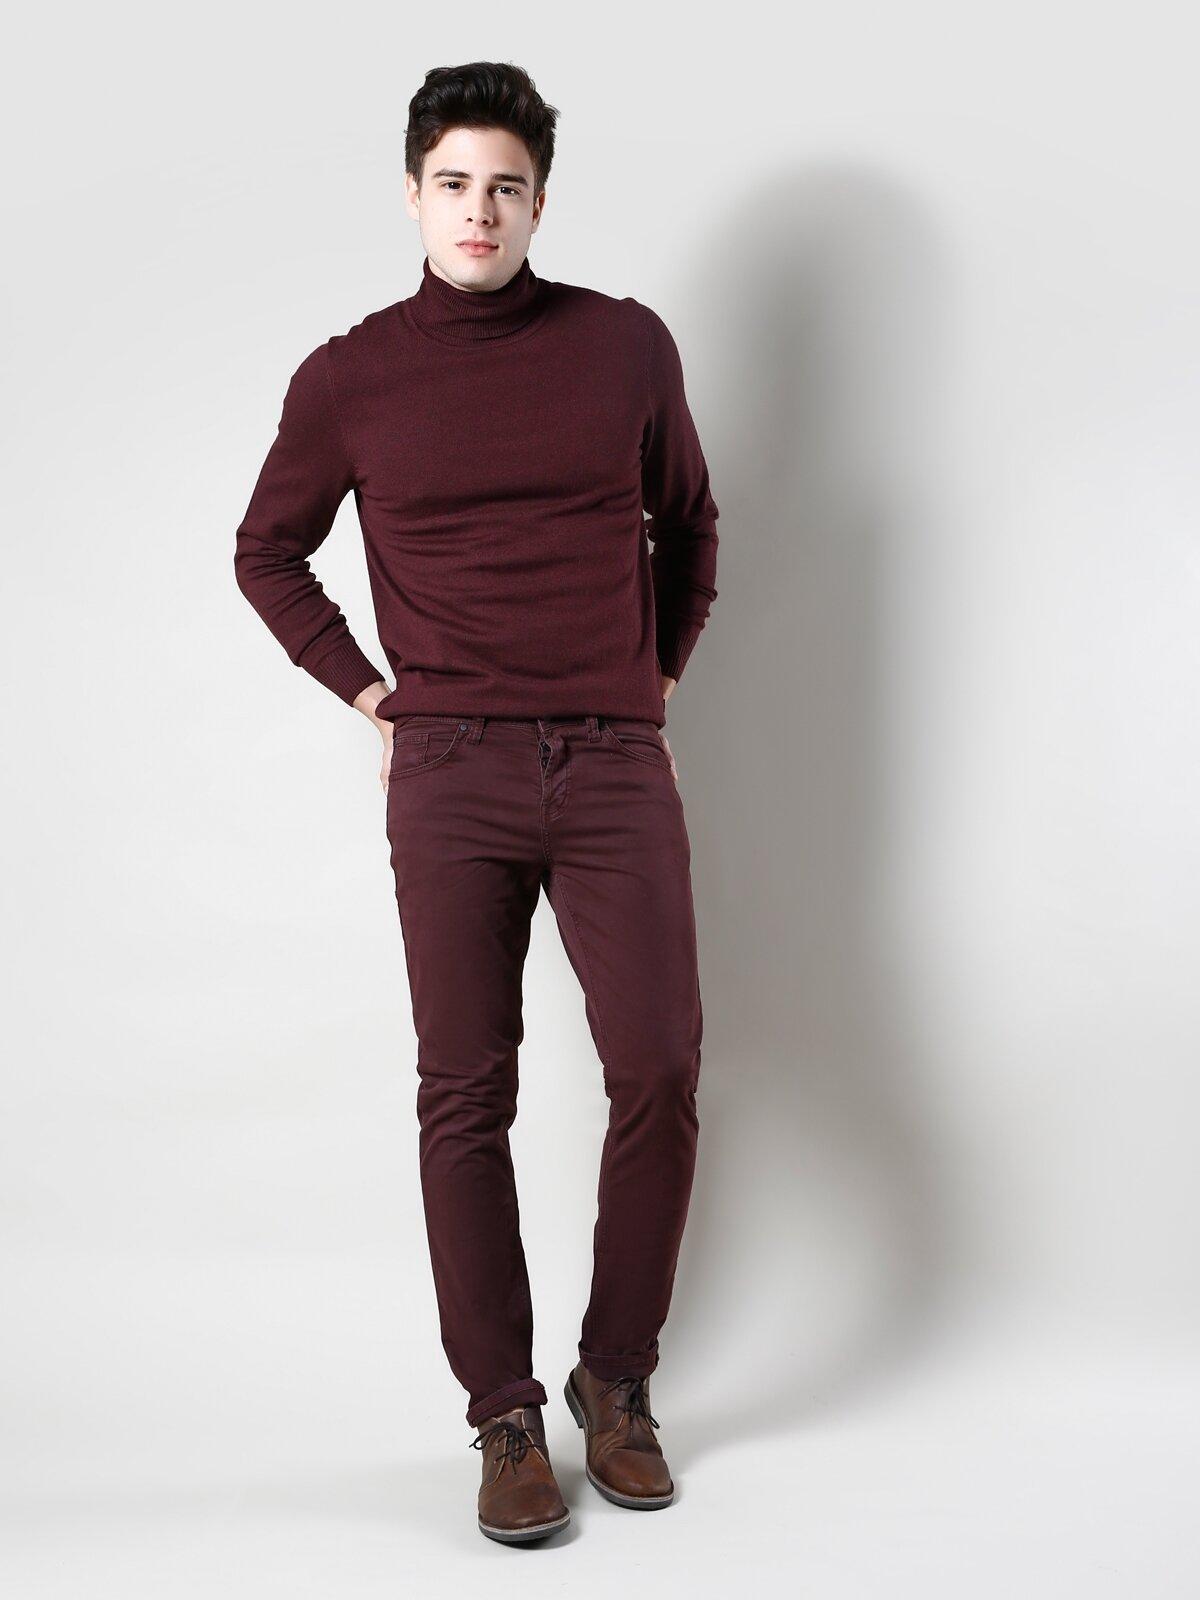 044 Karl Straight Fit Orta Bel Düz Paça Erkek Mor Pantolon